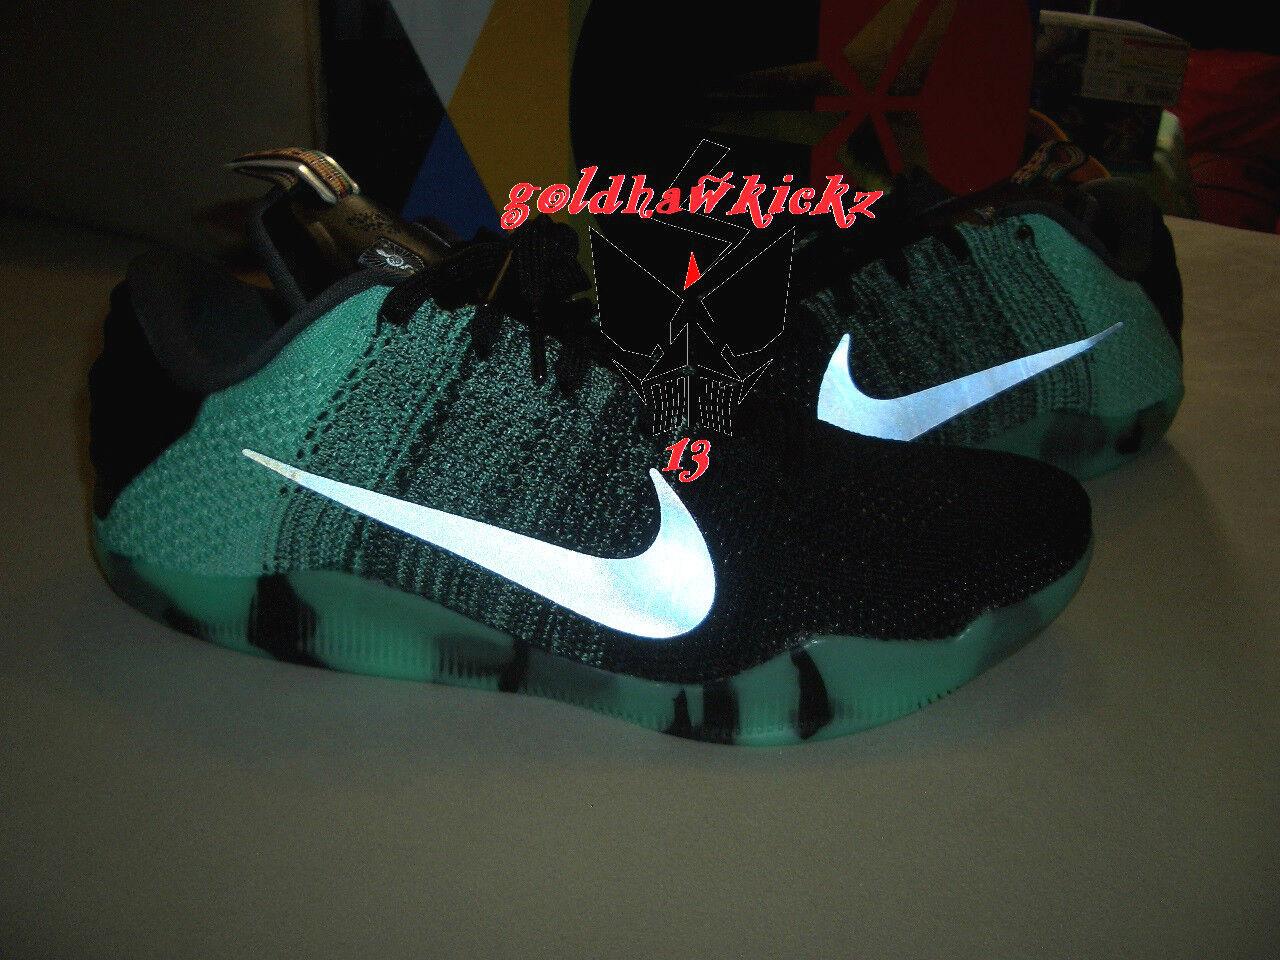 Nike kobe xi 11 elite bassa come all star game 822521-305 gitd toronto flash vendita